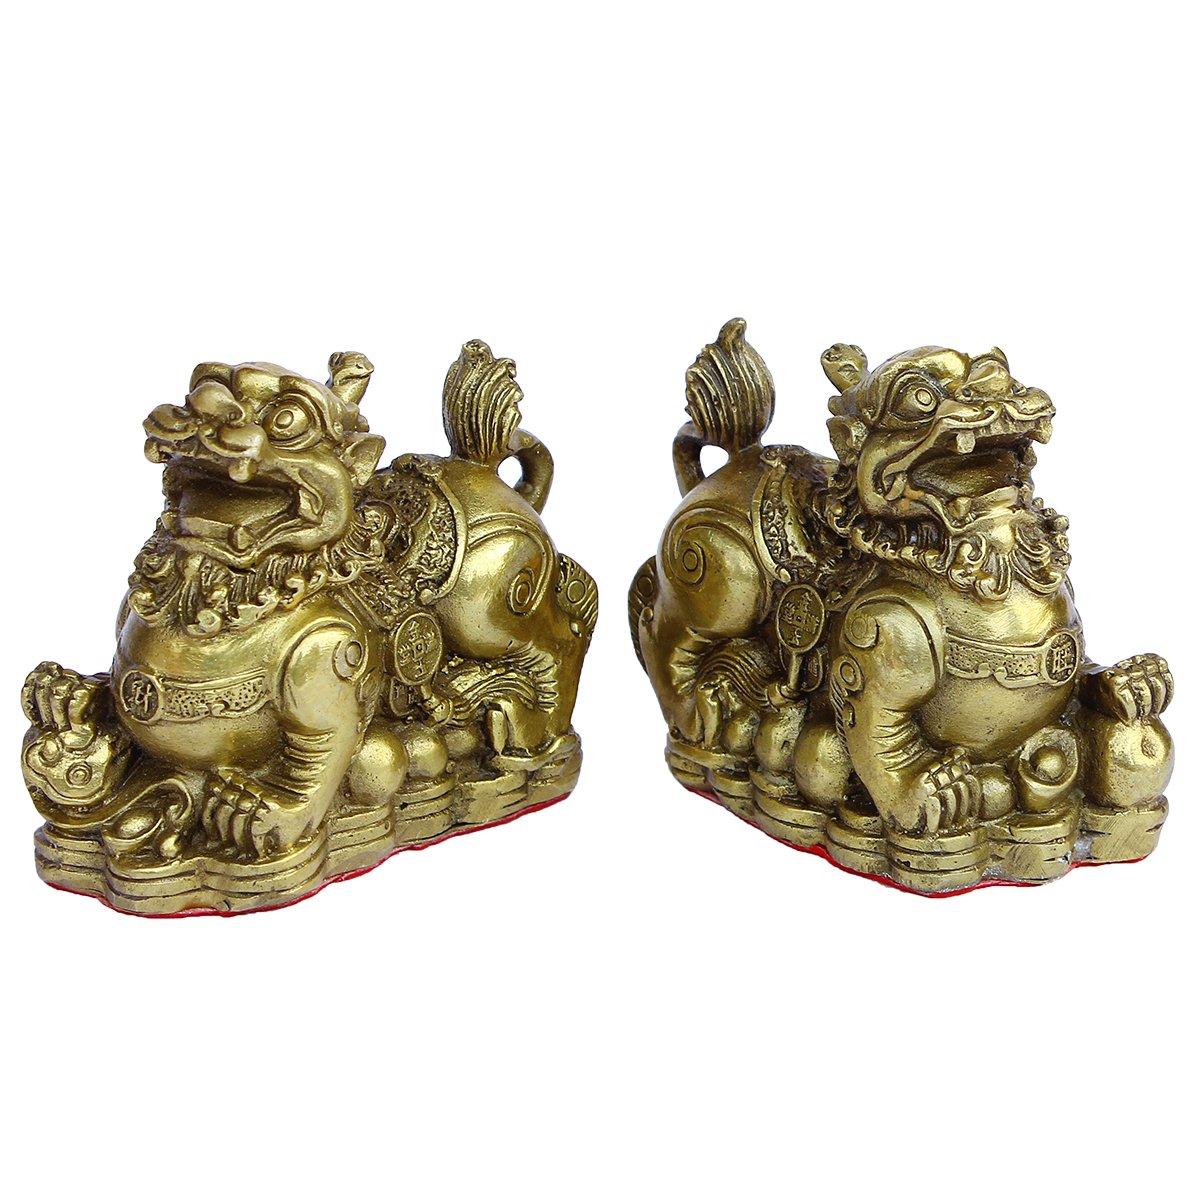 Handmade Brass Pi Yao /Pi Xiu for Wealth Figurine Collectible Home Decor Set of 2